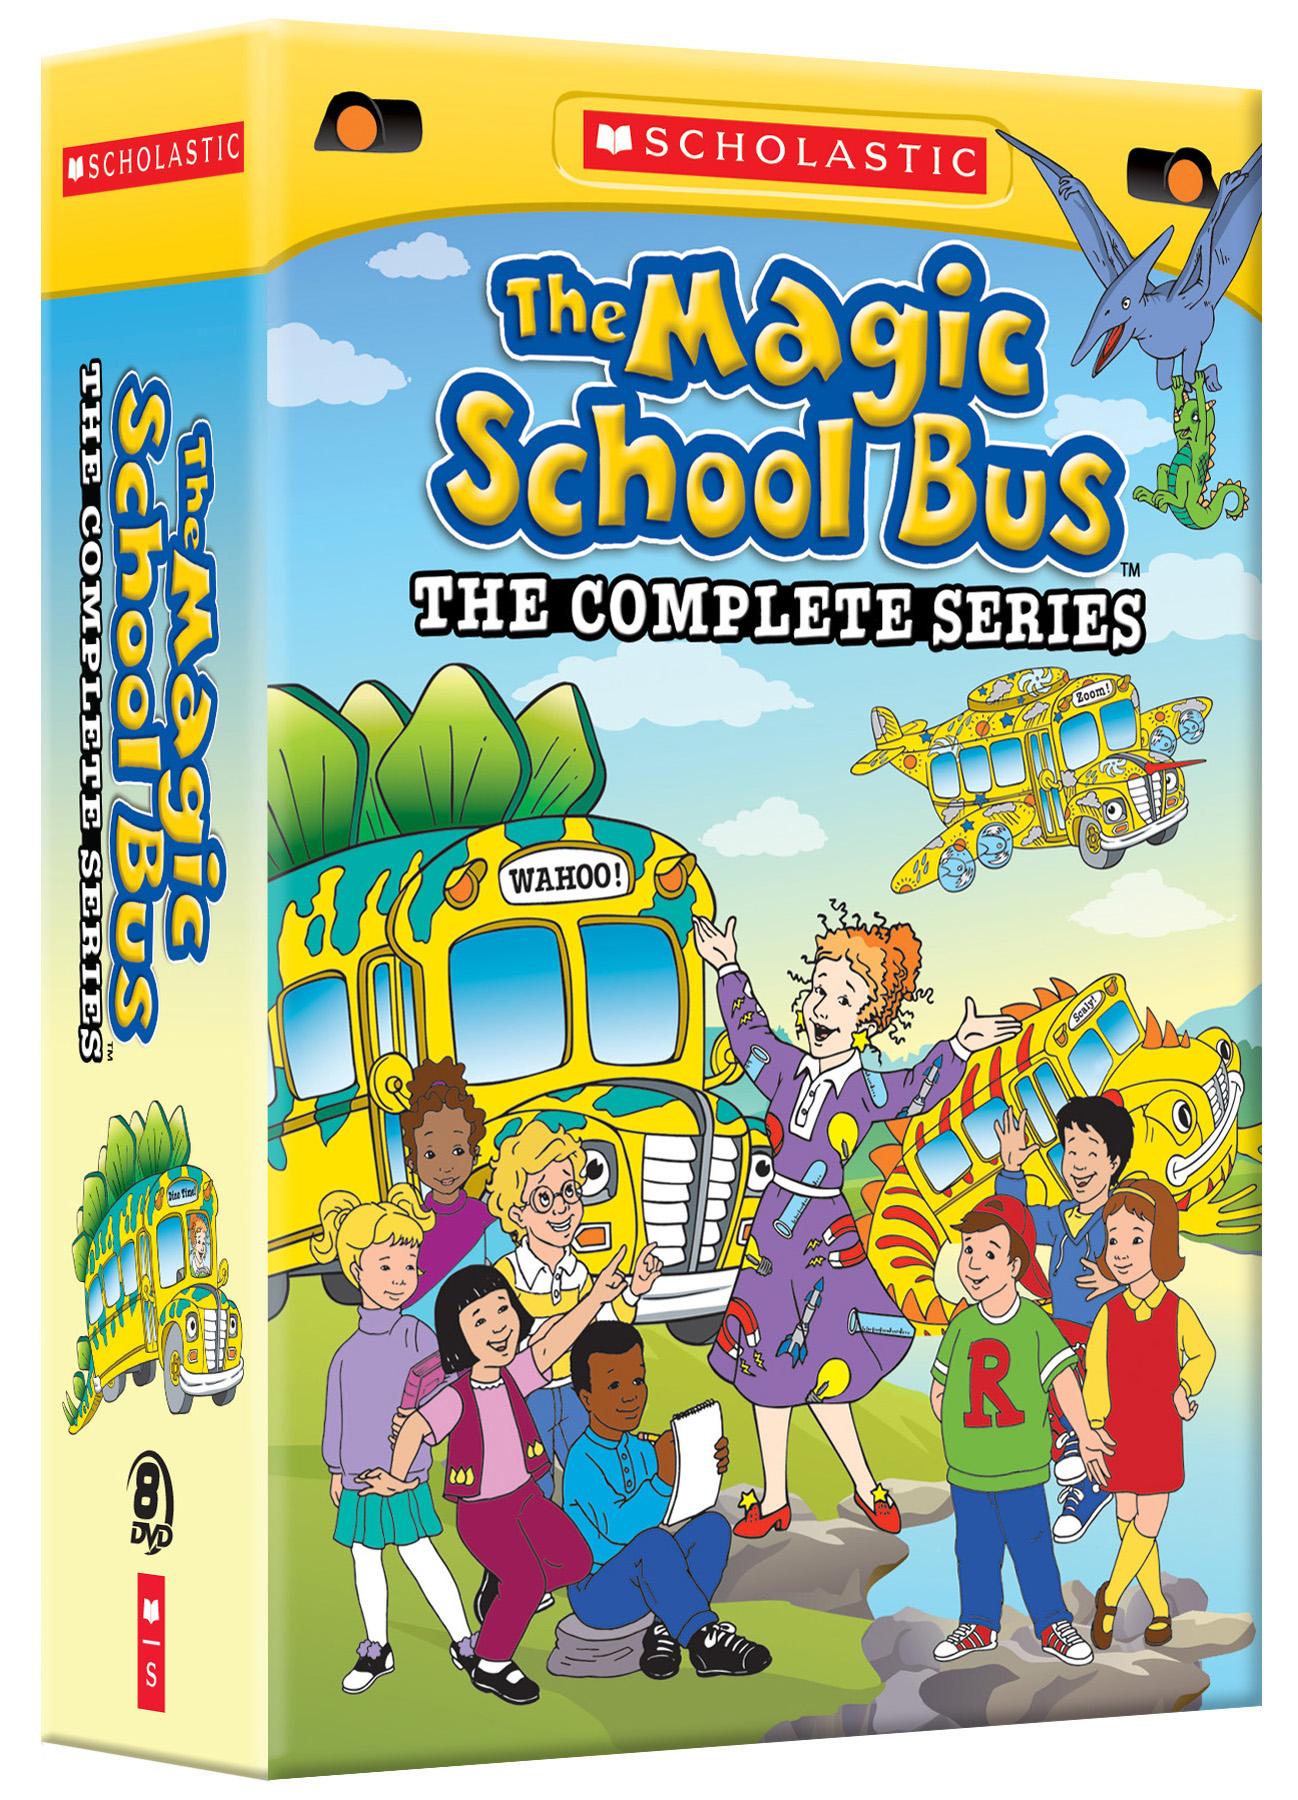 The Magic School Bus Complete Series 1-4 DVD Boxset